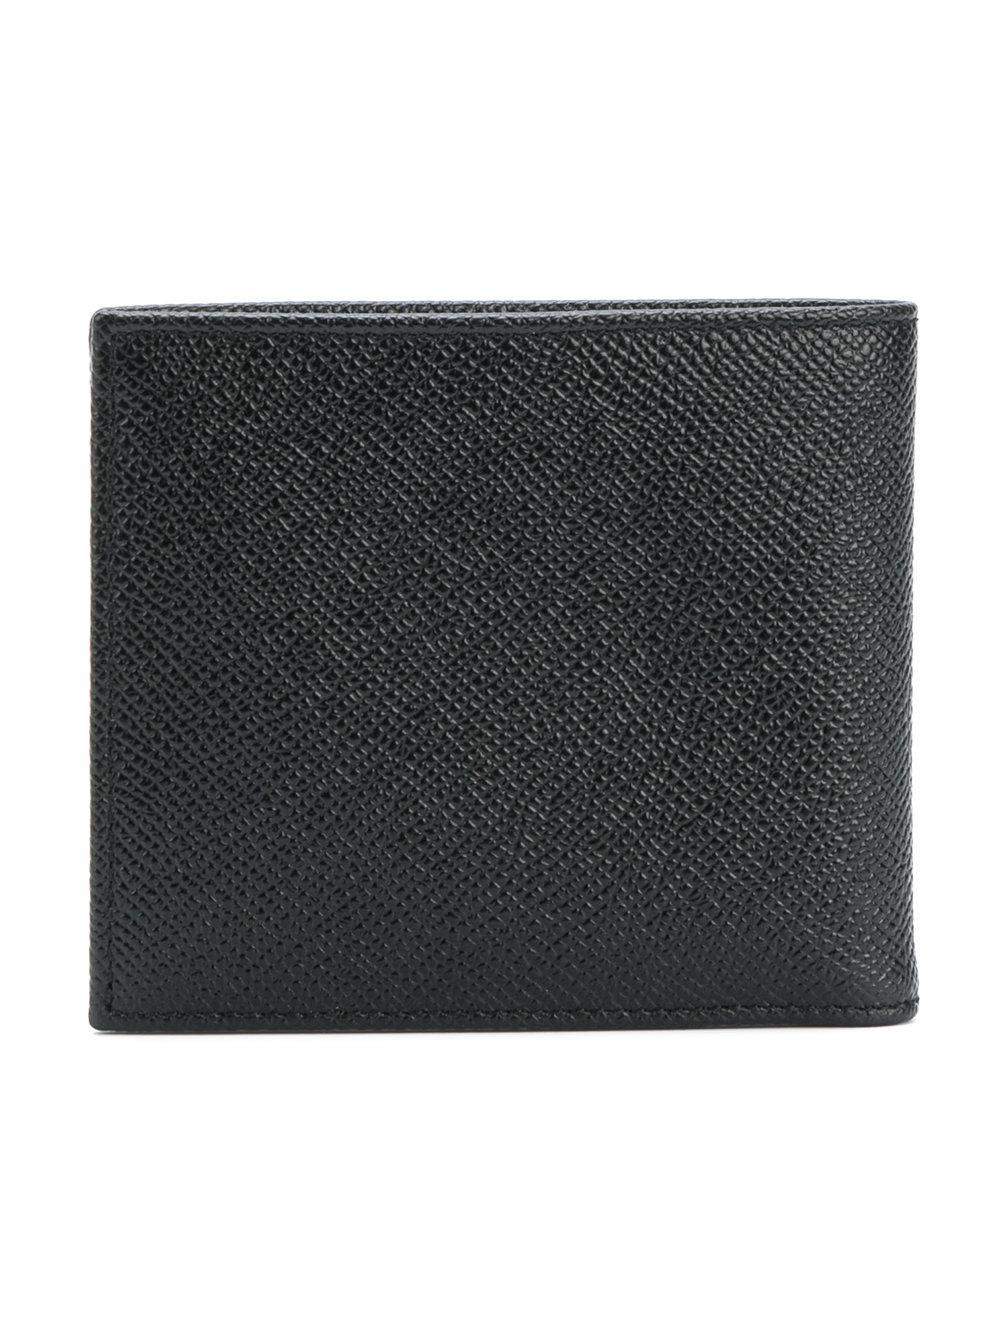 1d8b8a06e7 Lyst - Dolce & Gabbana Logo Plaque Billfold Wallet in Black for Men